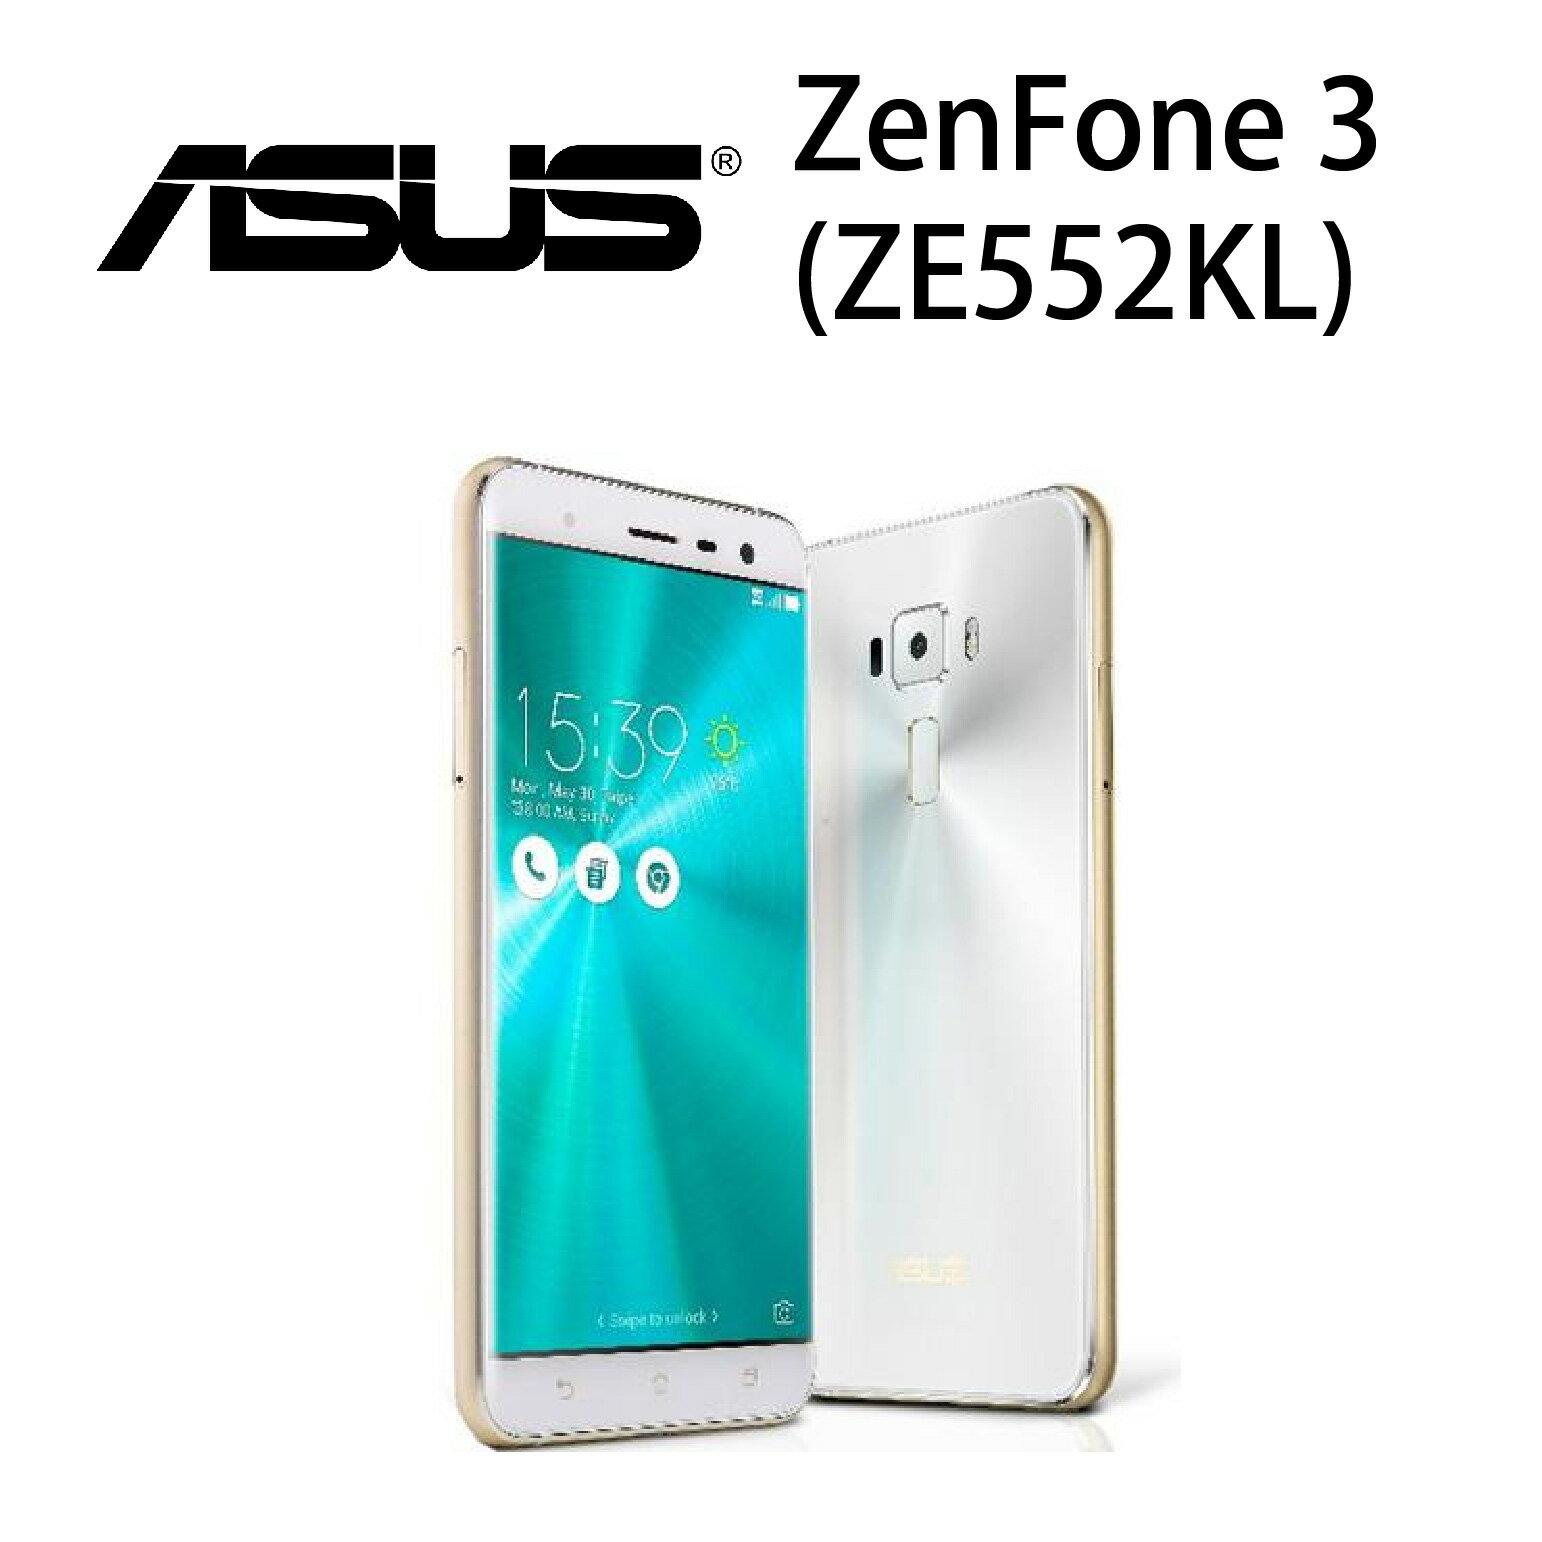 AUSU Zenfone3(ZE552KL)攜碼/新辦/續約遠傳電信門號專案 手機最低1元